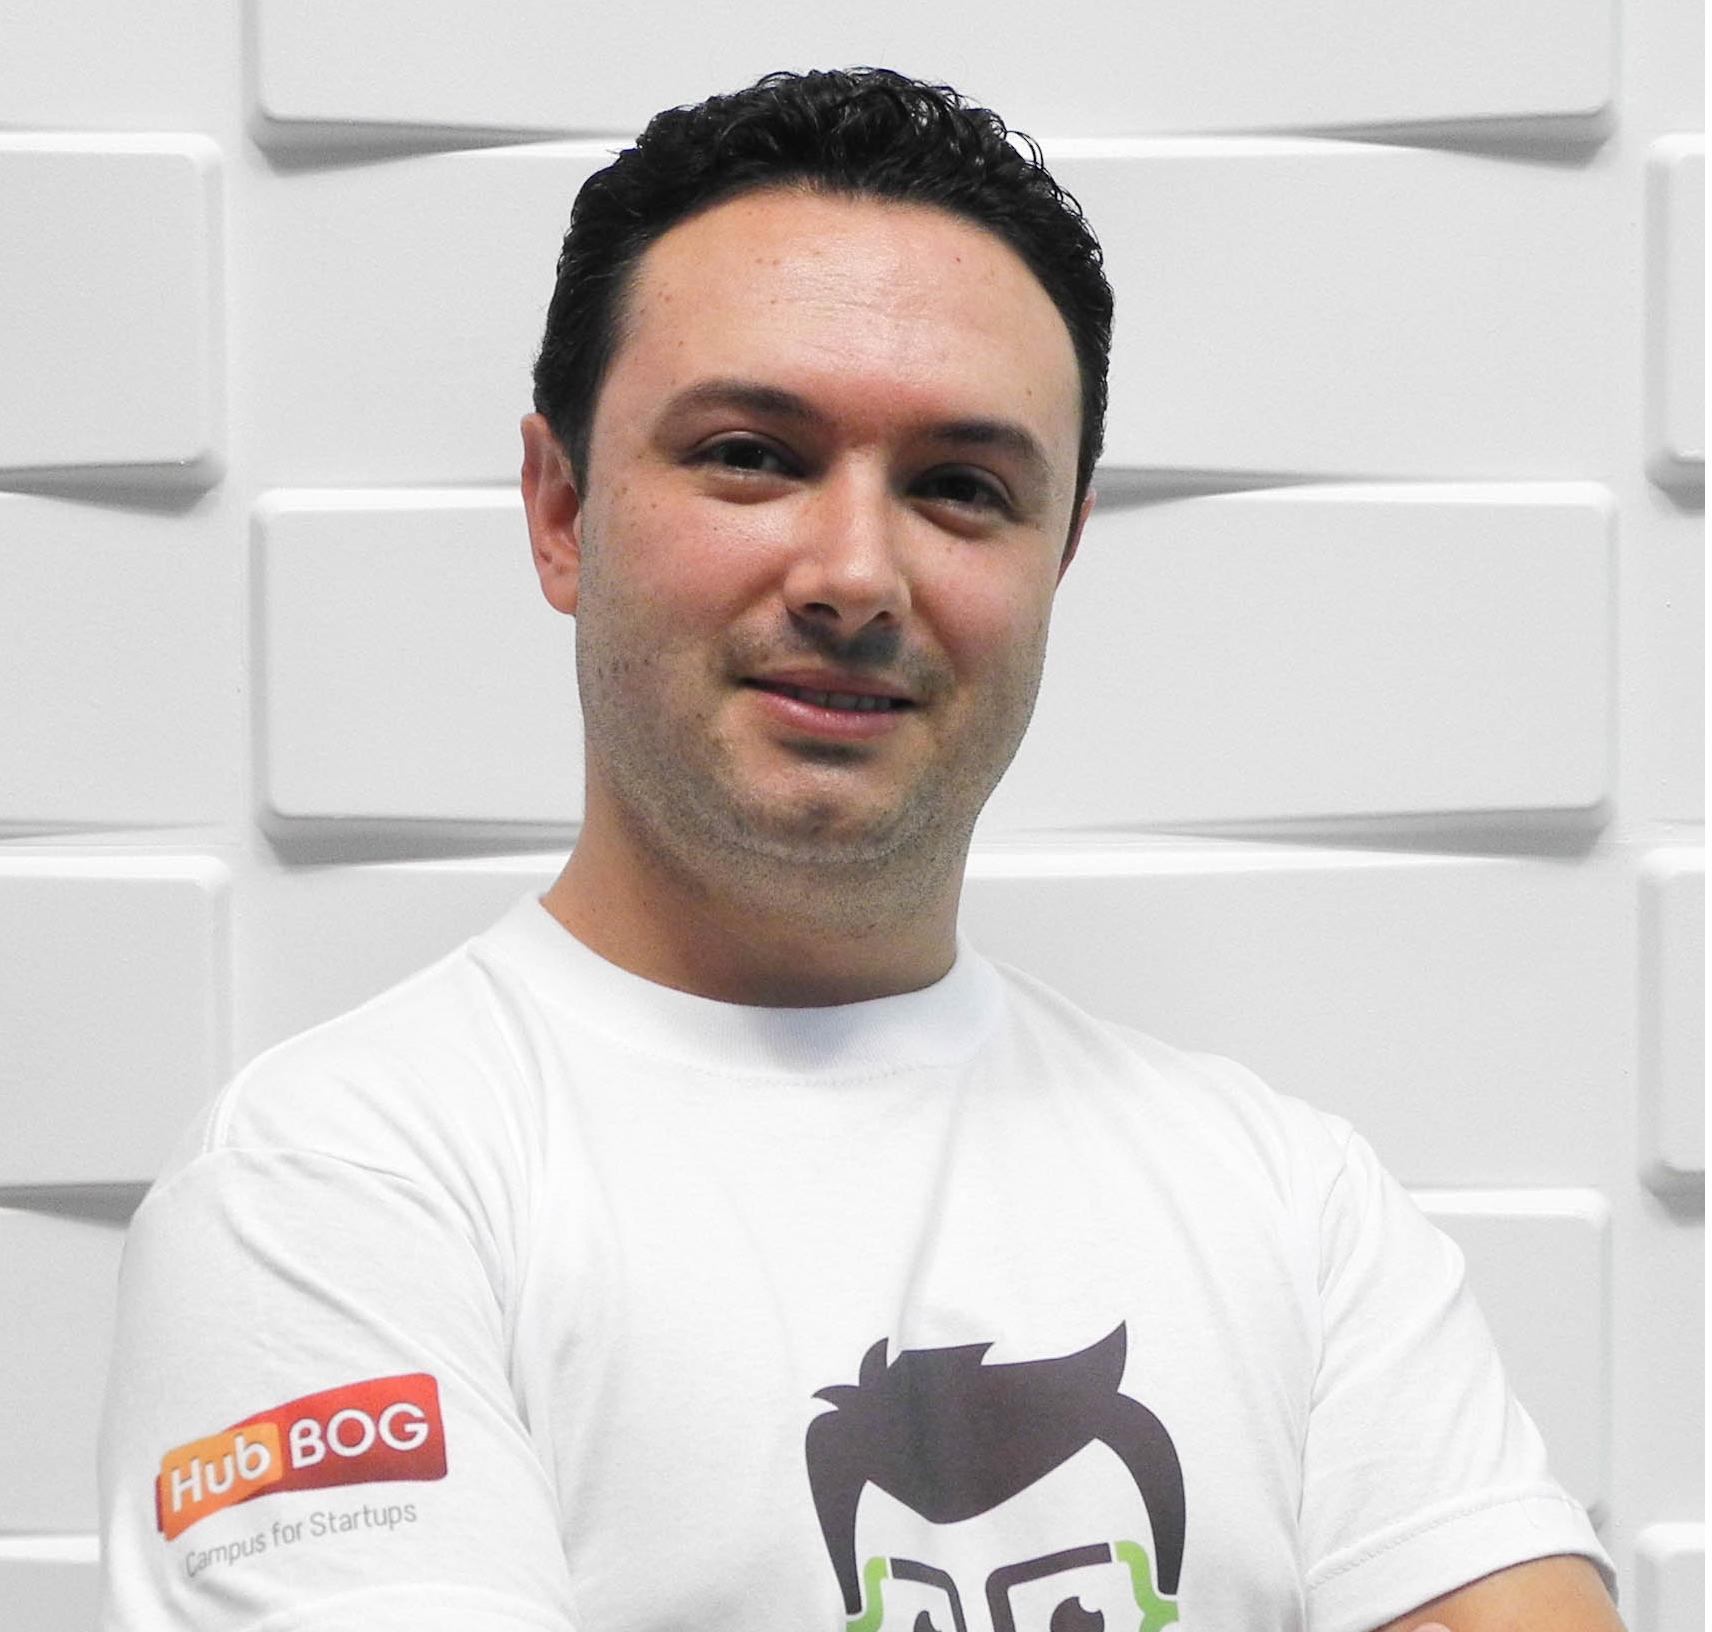 Mysql workbench mentor, Mysql workbench expert, Mysql workbench code help